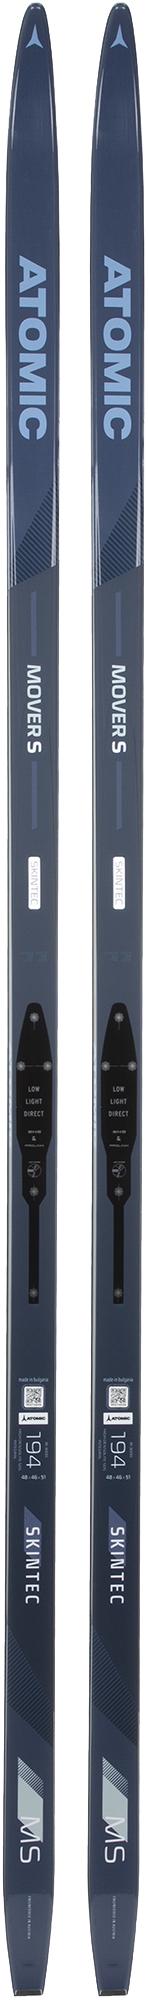 Atomic Беговые лыжи Atomic Mover Skintec, размер 204 rg512 g50071 204